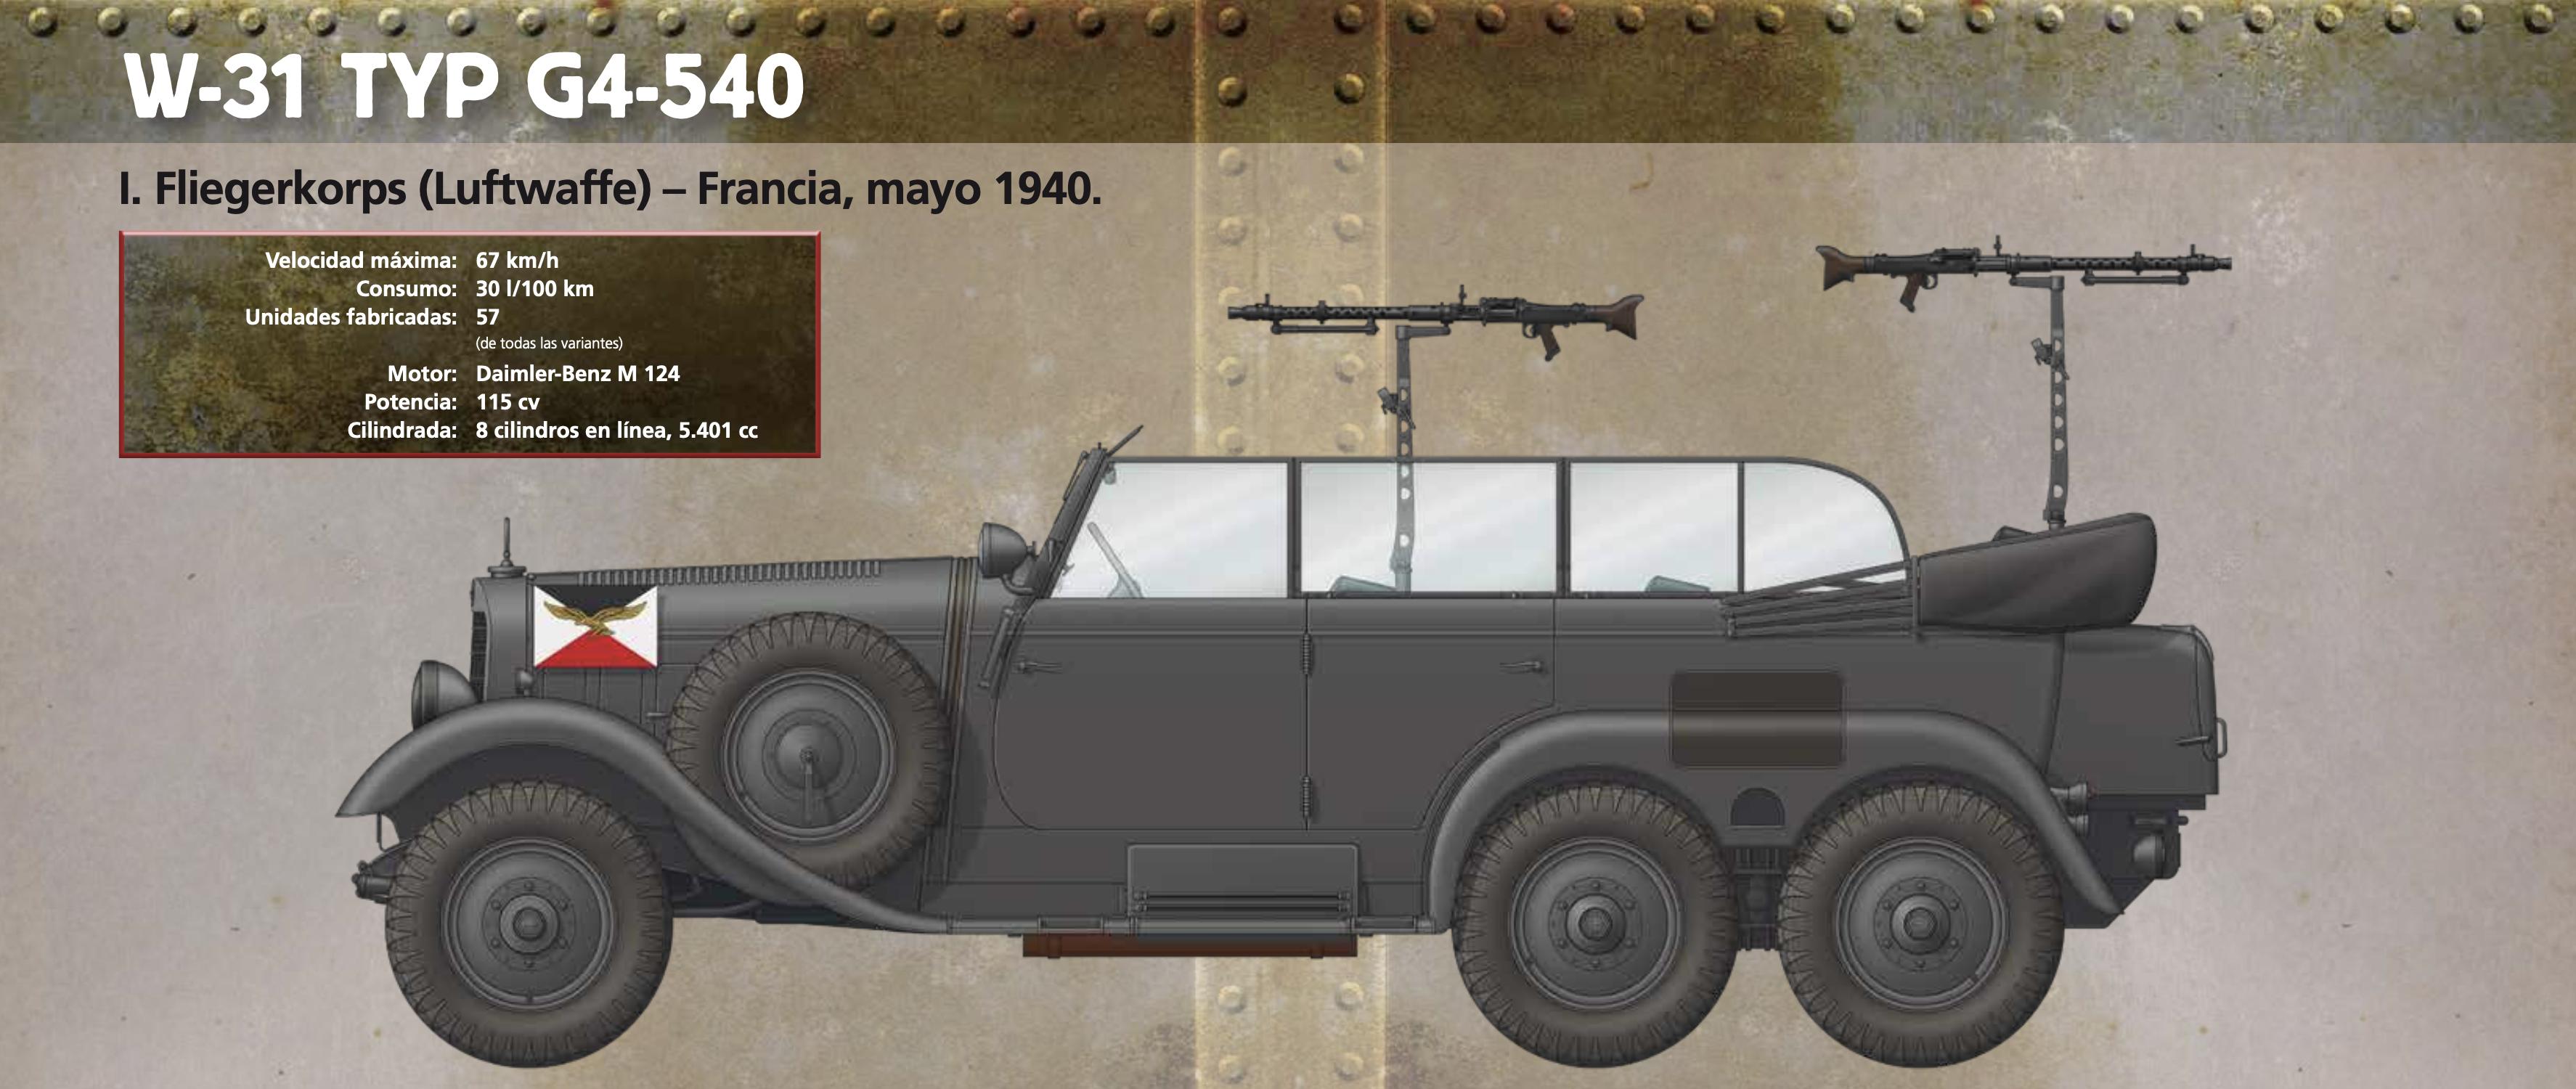 Vehiculos Militares Mercedes Benz W31 Typ G4 540 Herodoto Cia